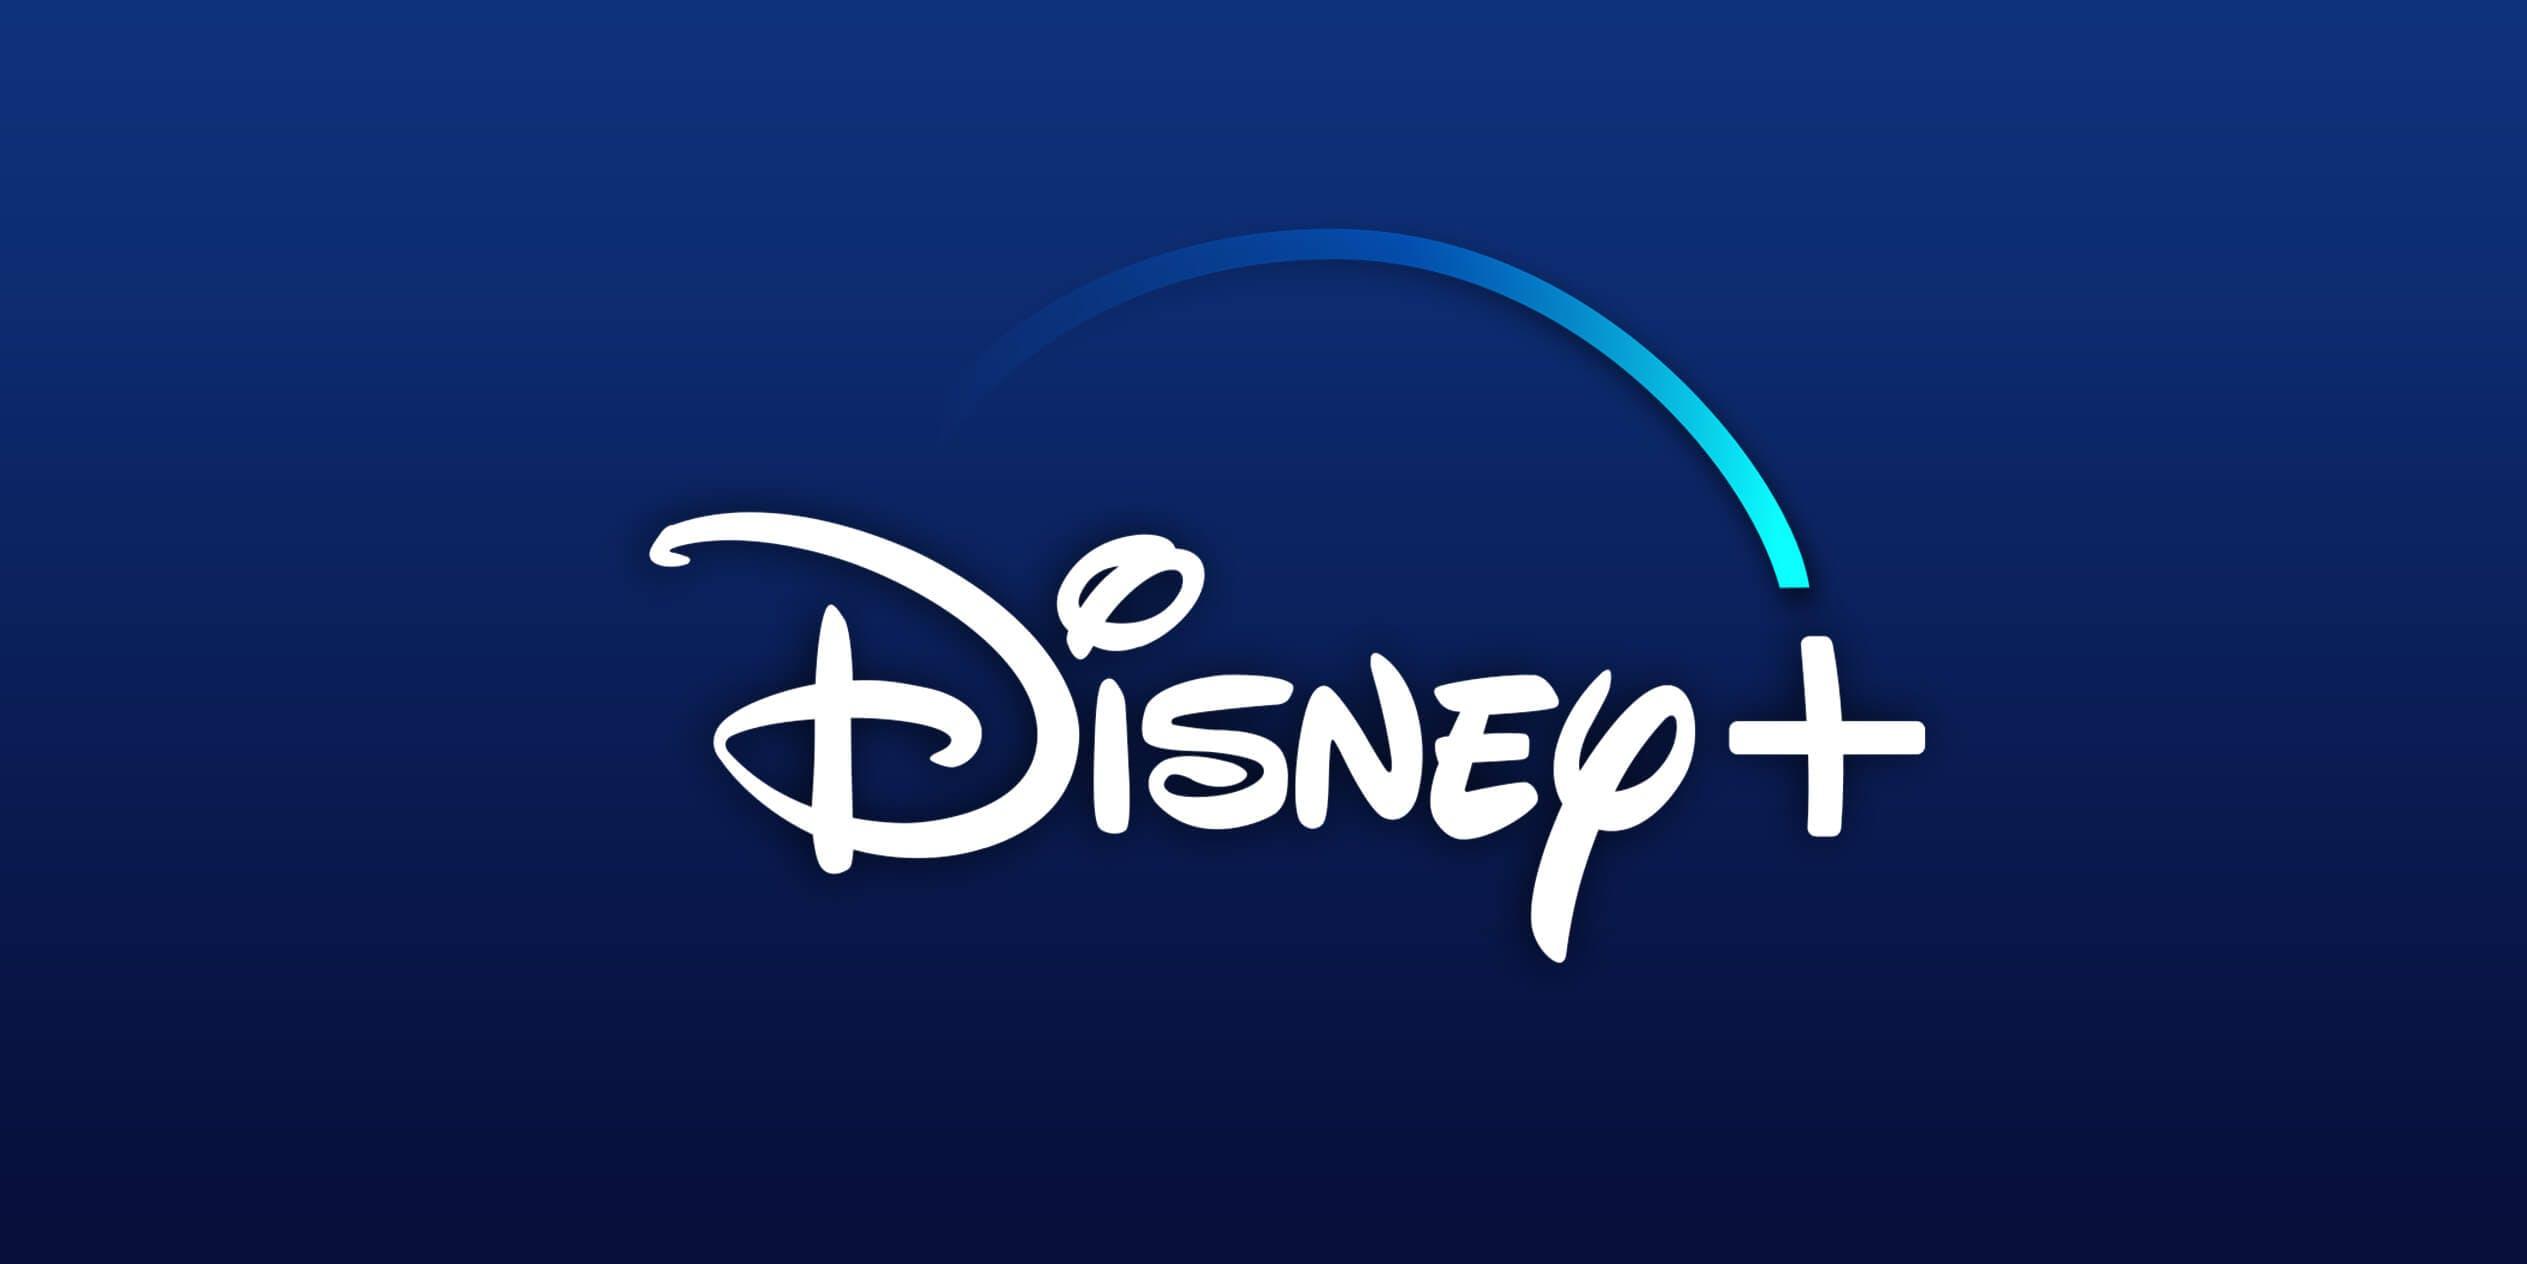 watch Star Wars the clone wars season 7 on Disney Plus